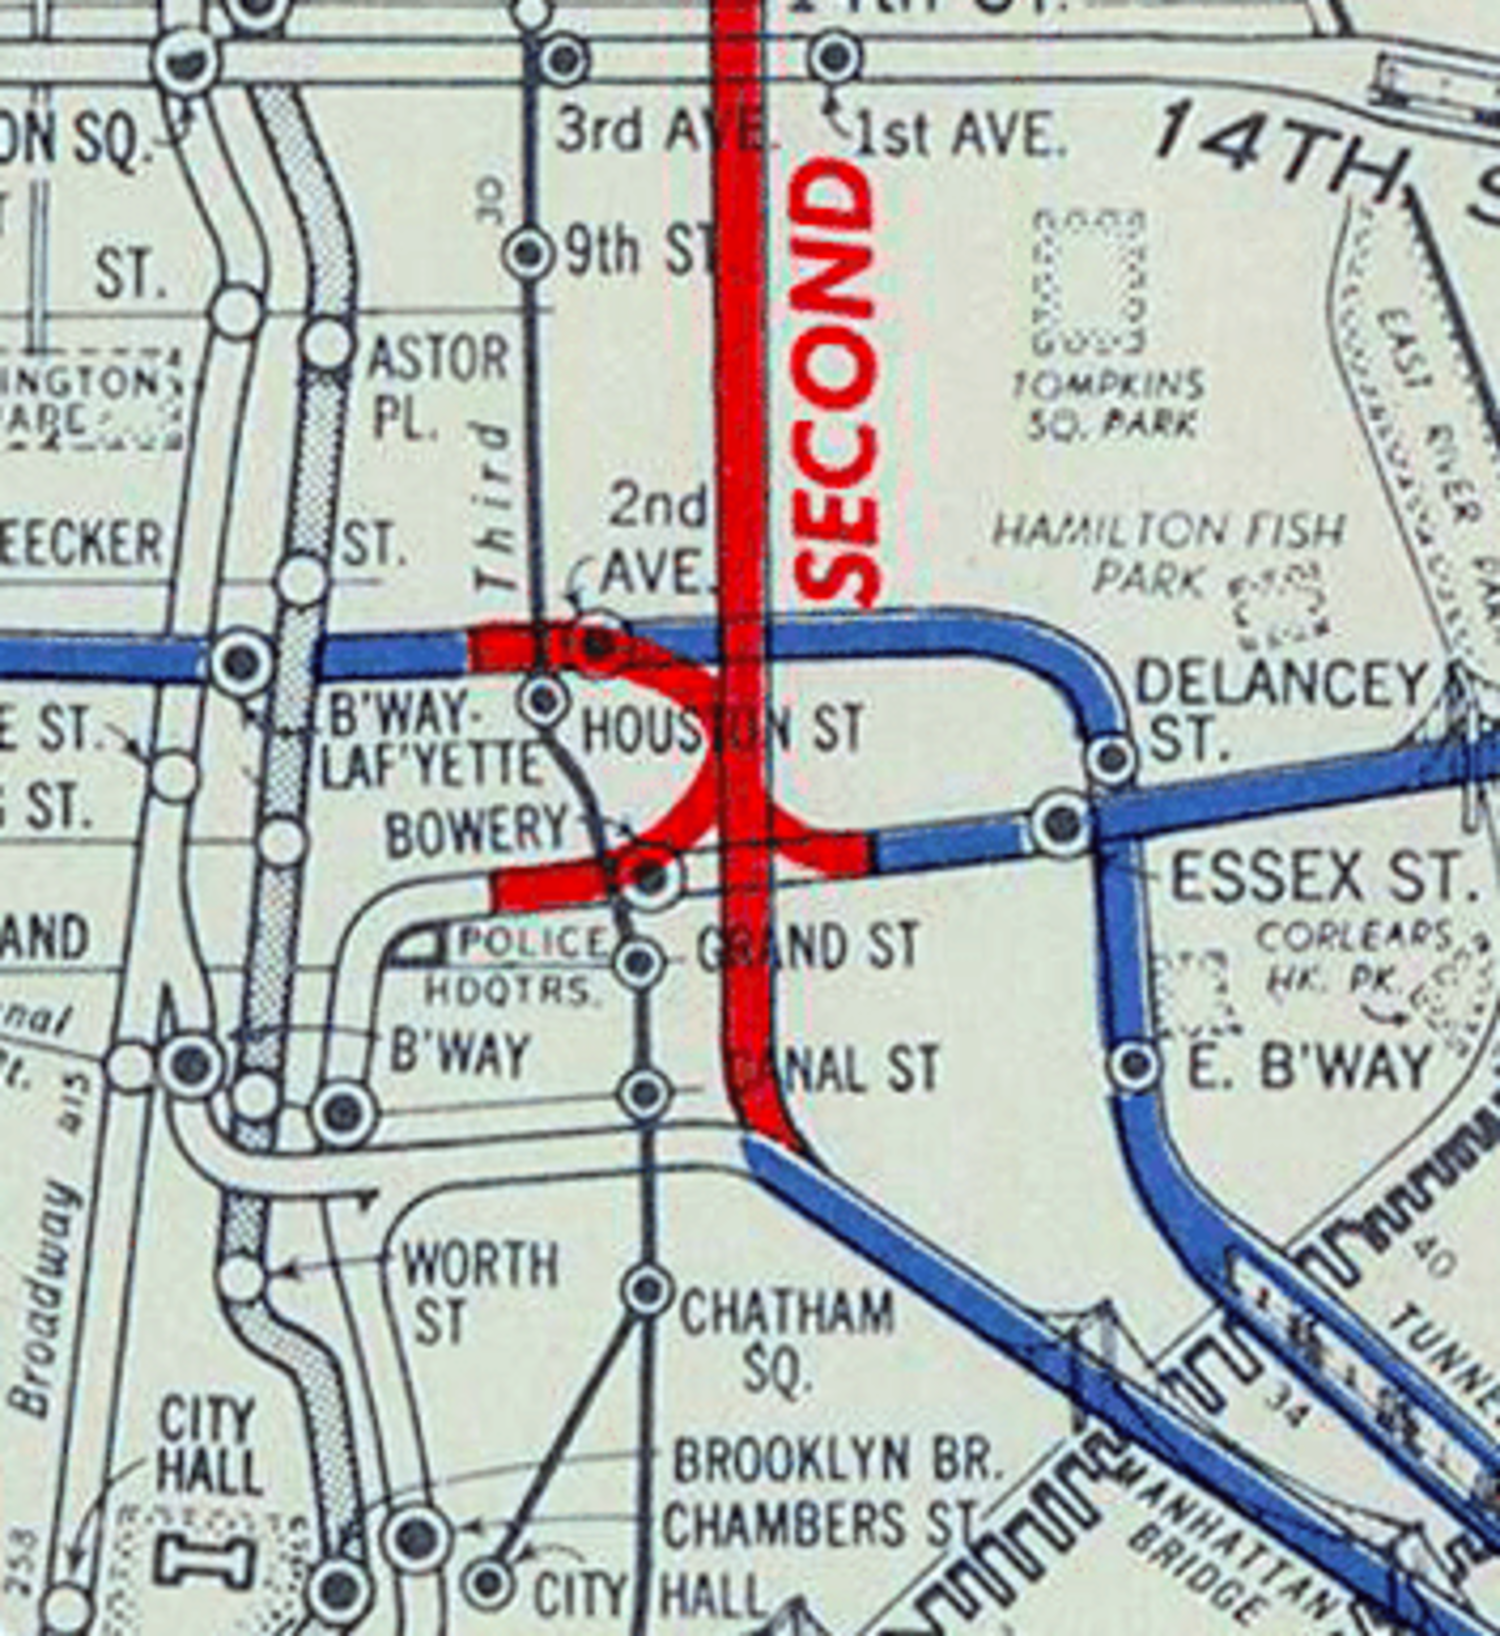 New Second Avenue Subway Map.Map Porn A History Of Second Avenue Subway Through Vintage Maps